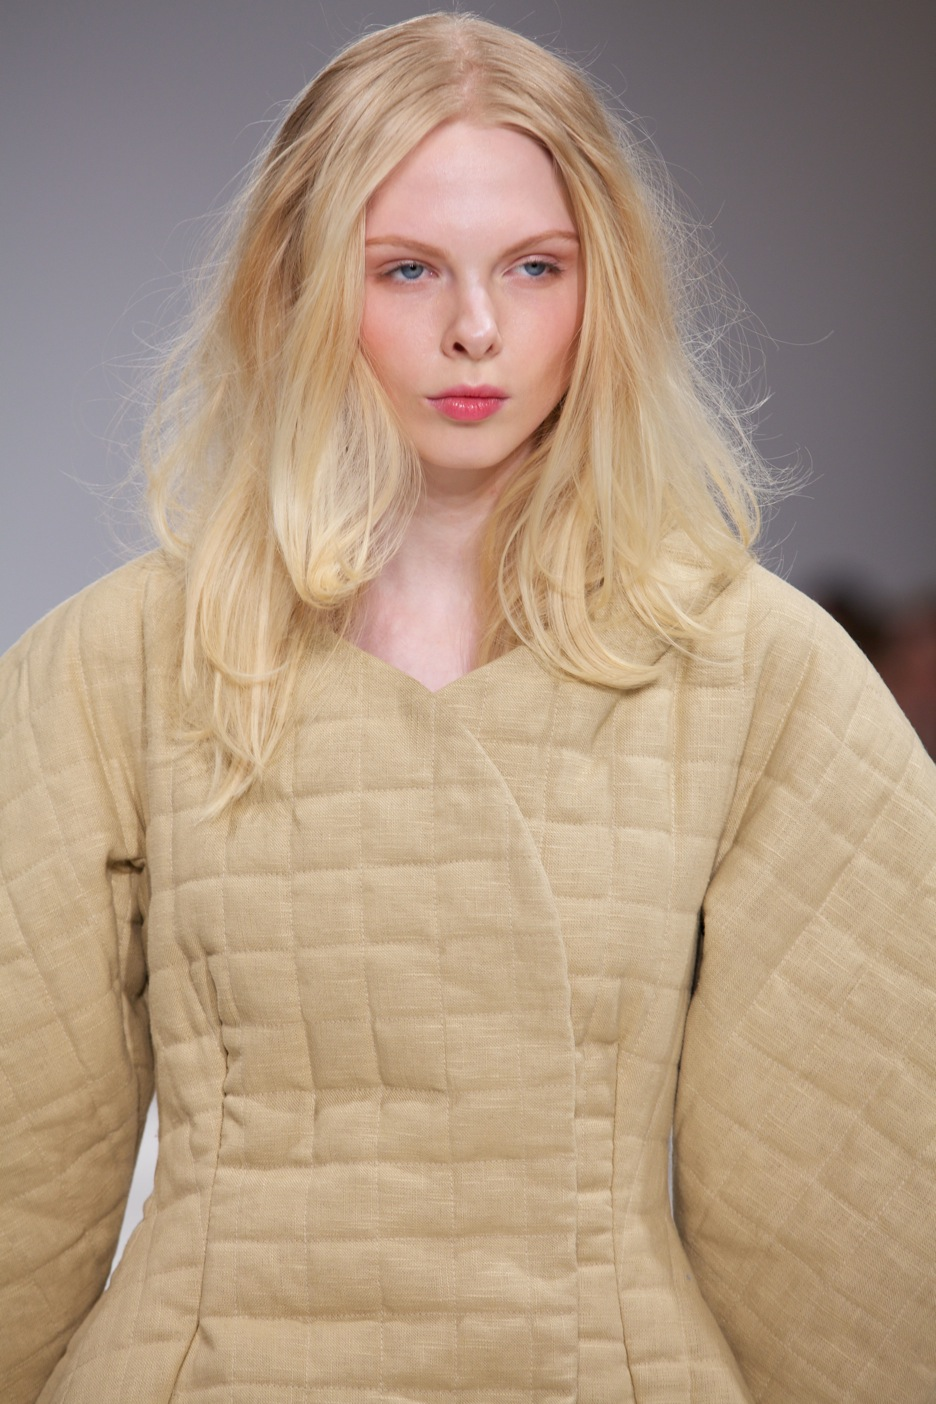 Kiev Fashion Days A-W 2014 (c) Marc aitken 2014  23.jpg